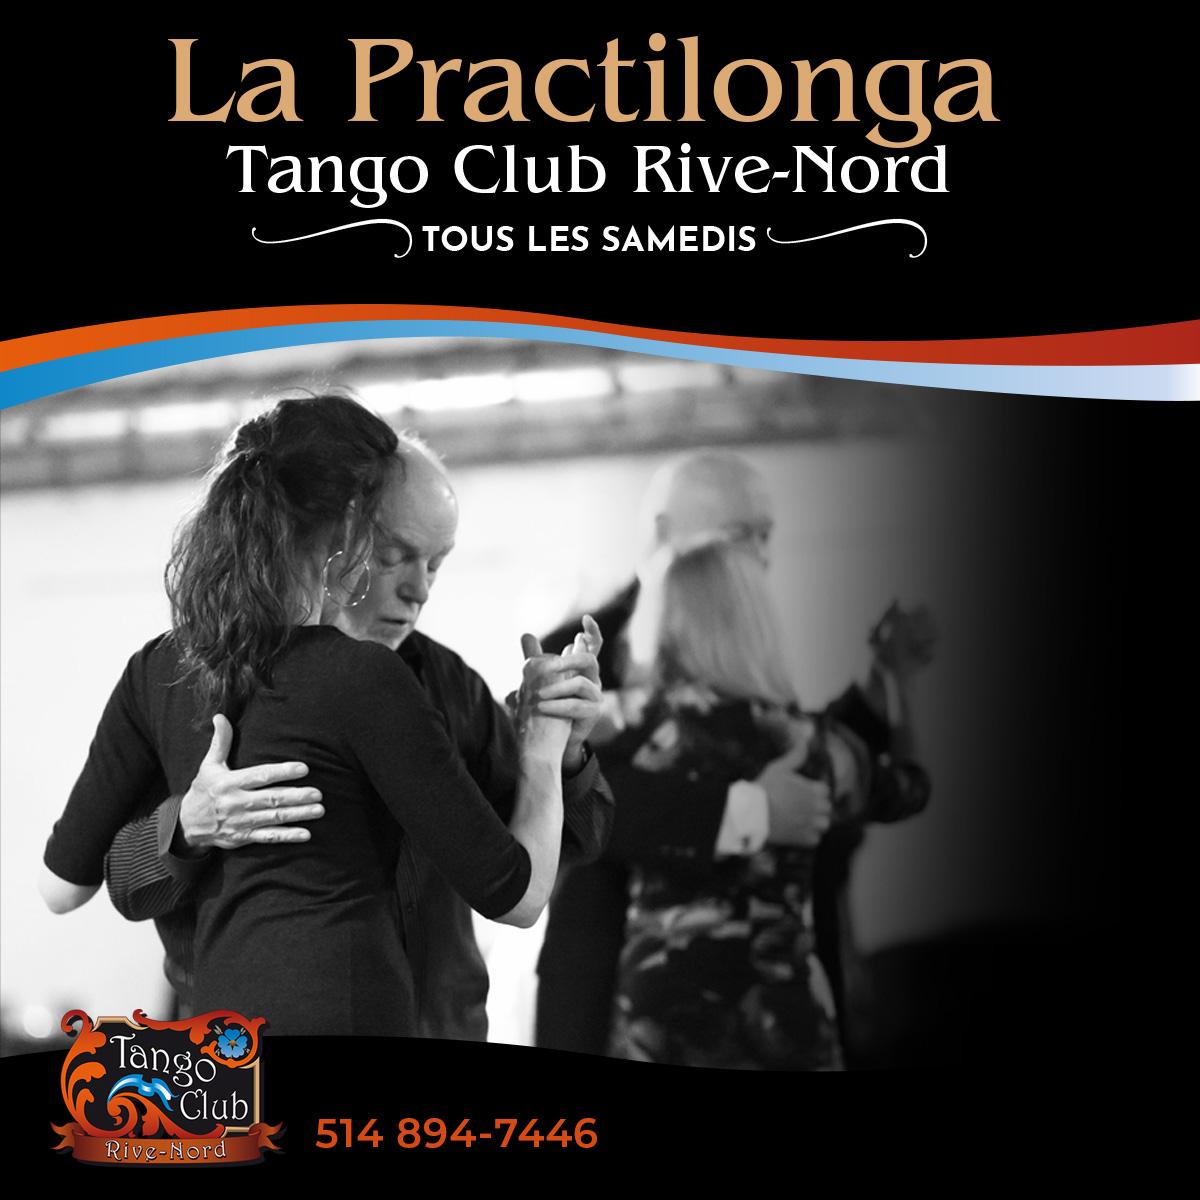 la practilonga tango club rive nord